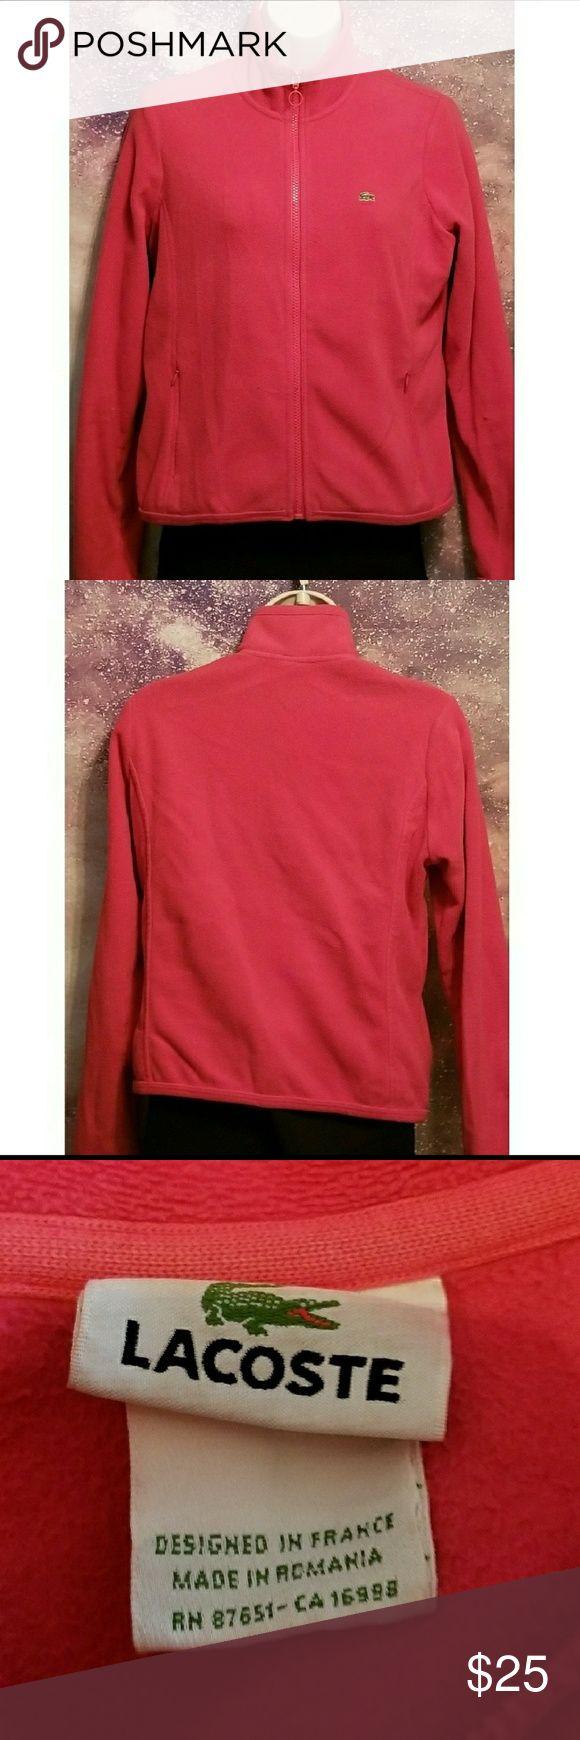 Lacoste Pink Fleece Zip Up Jacket Size 40/Large excellent condition Lacoste Jackets & Coats